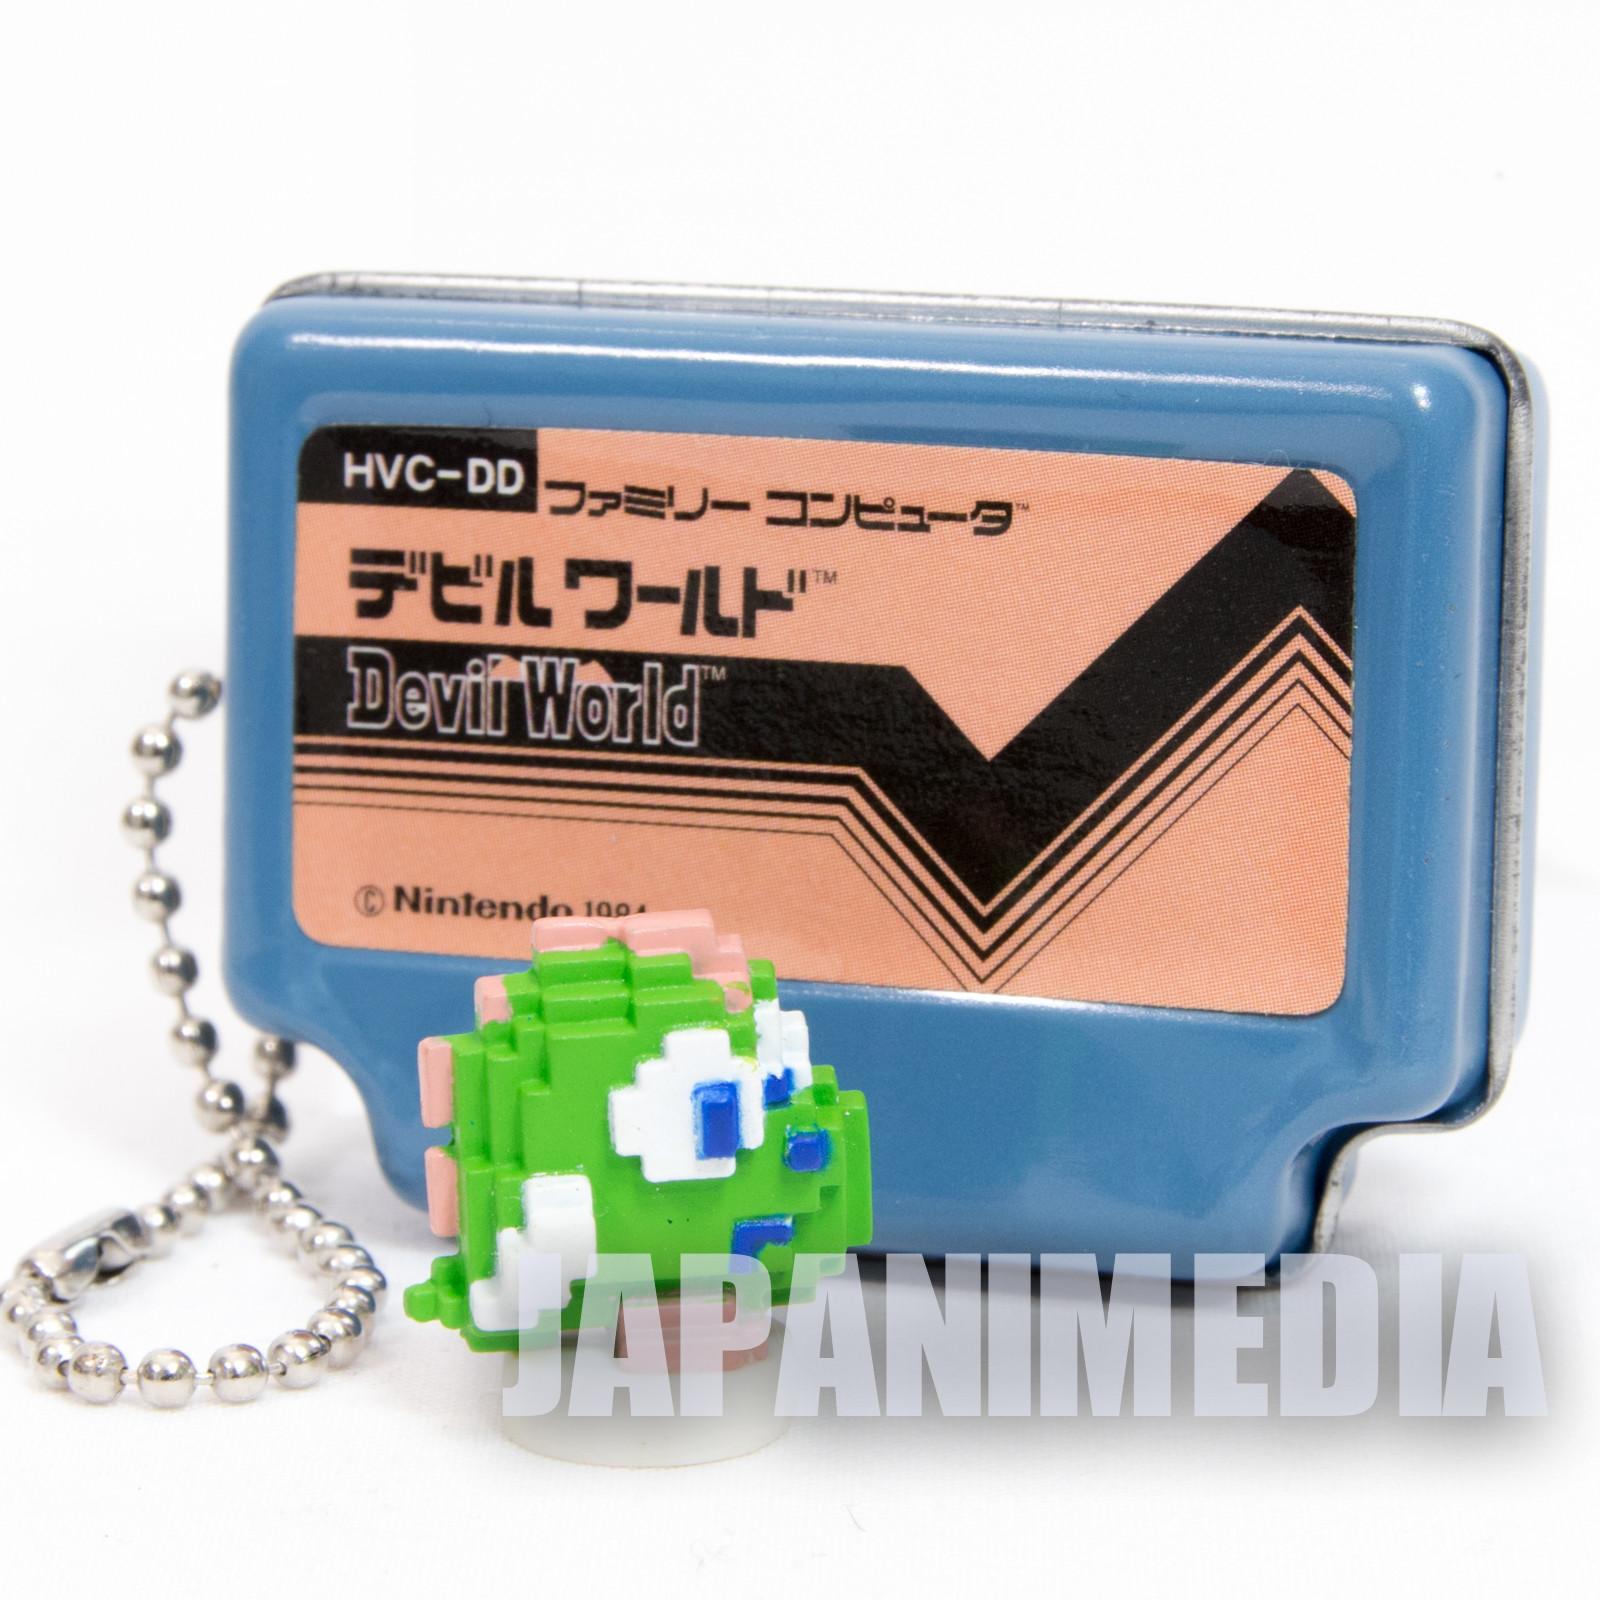 DEVIL WORLD Famicom Mini Can Case Keychain + Dot Figure Epoch JAPAN